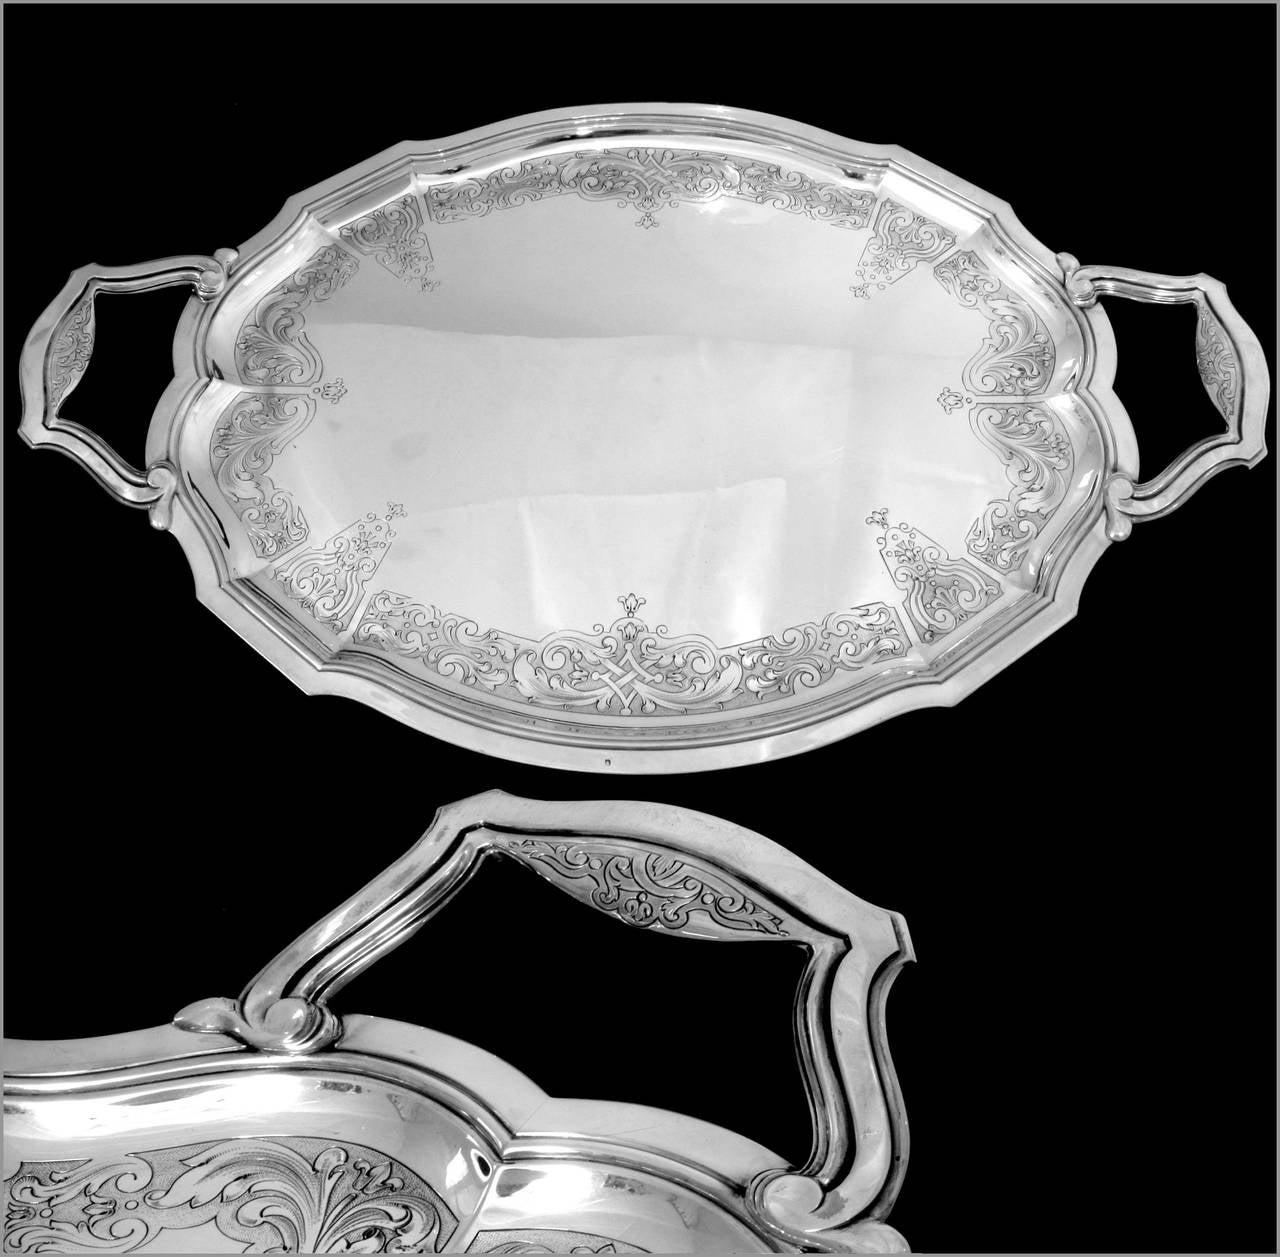 tetard imposing french sterling silver serving tray regence 2473 gr at 1stdibs